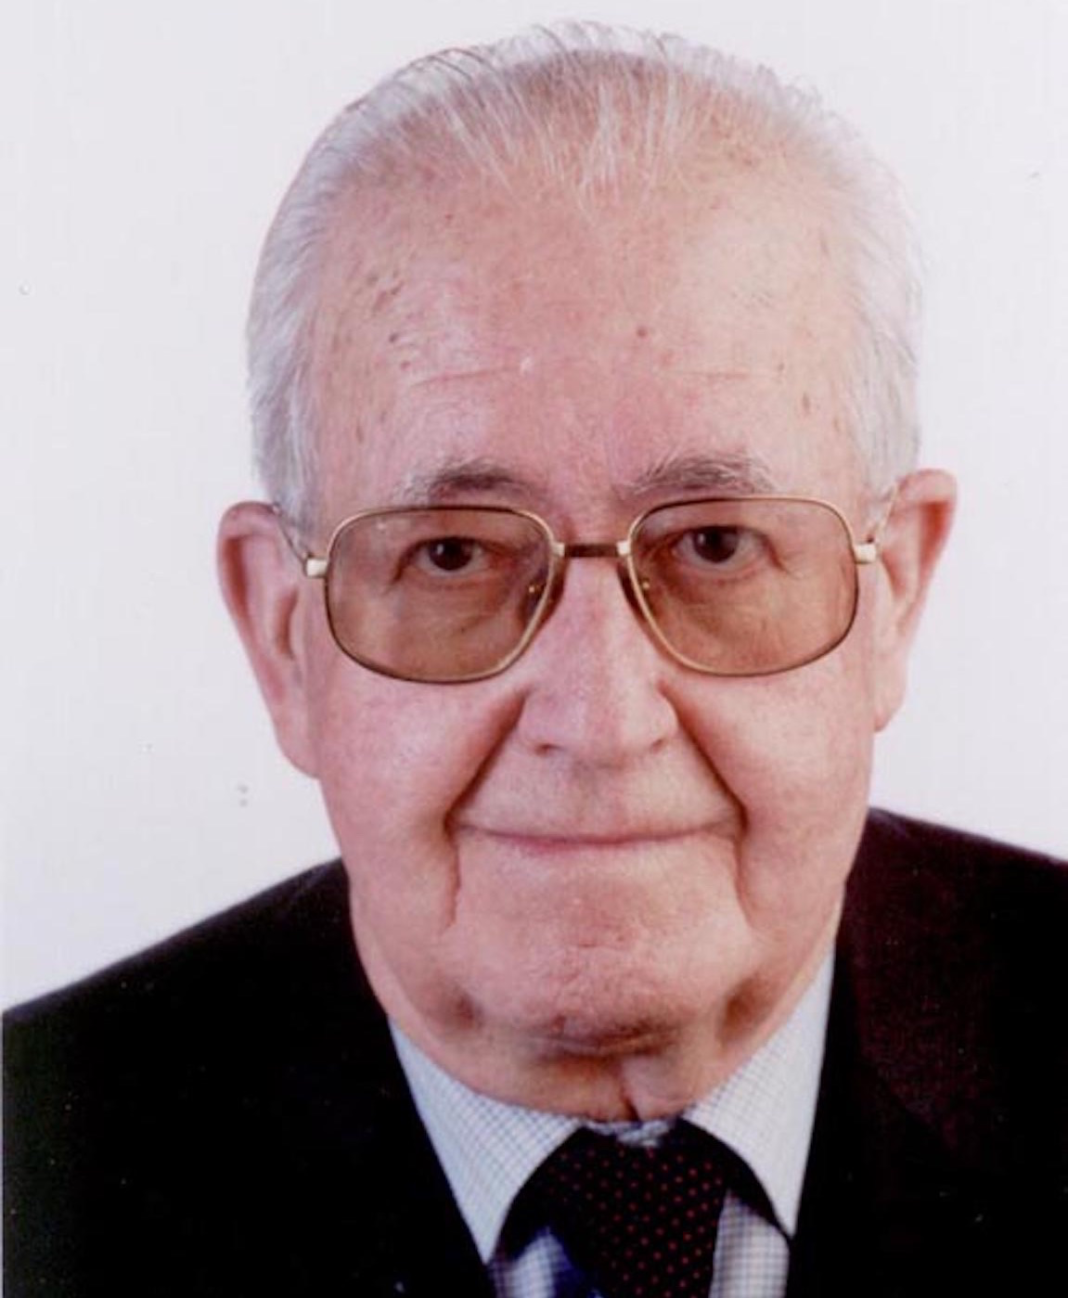 don pedro roncero menchen 1068x1298 - Don Pedro Roncero: Setenta años de vida sacerdotal